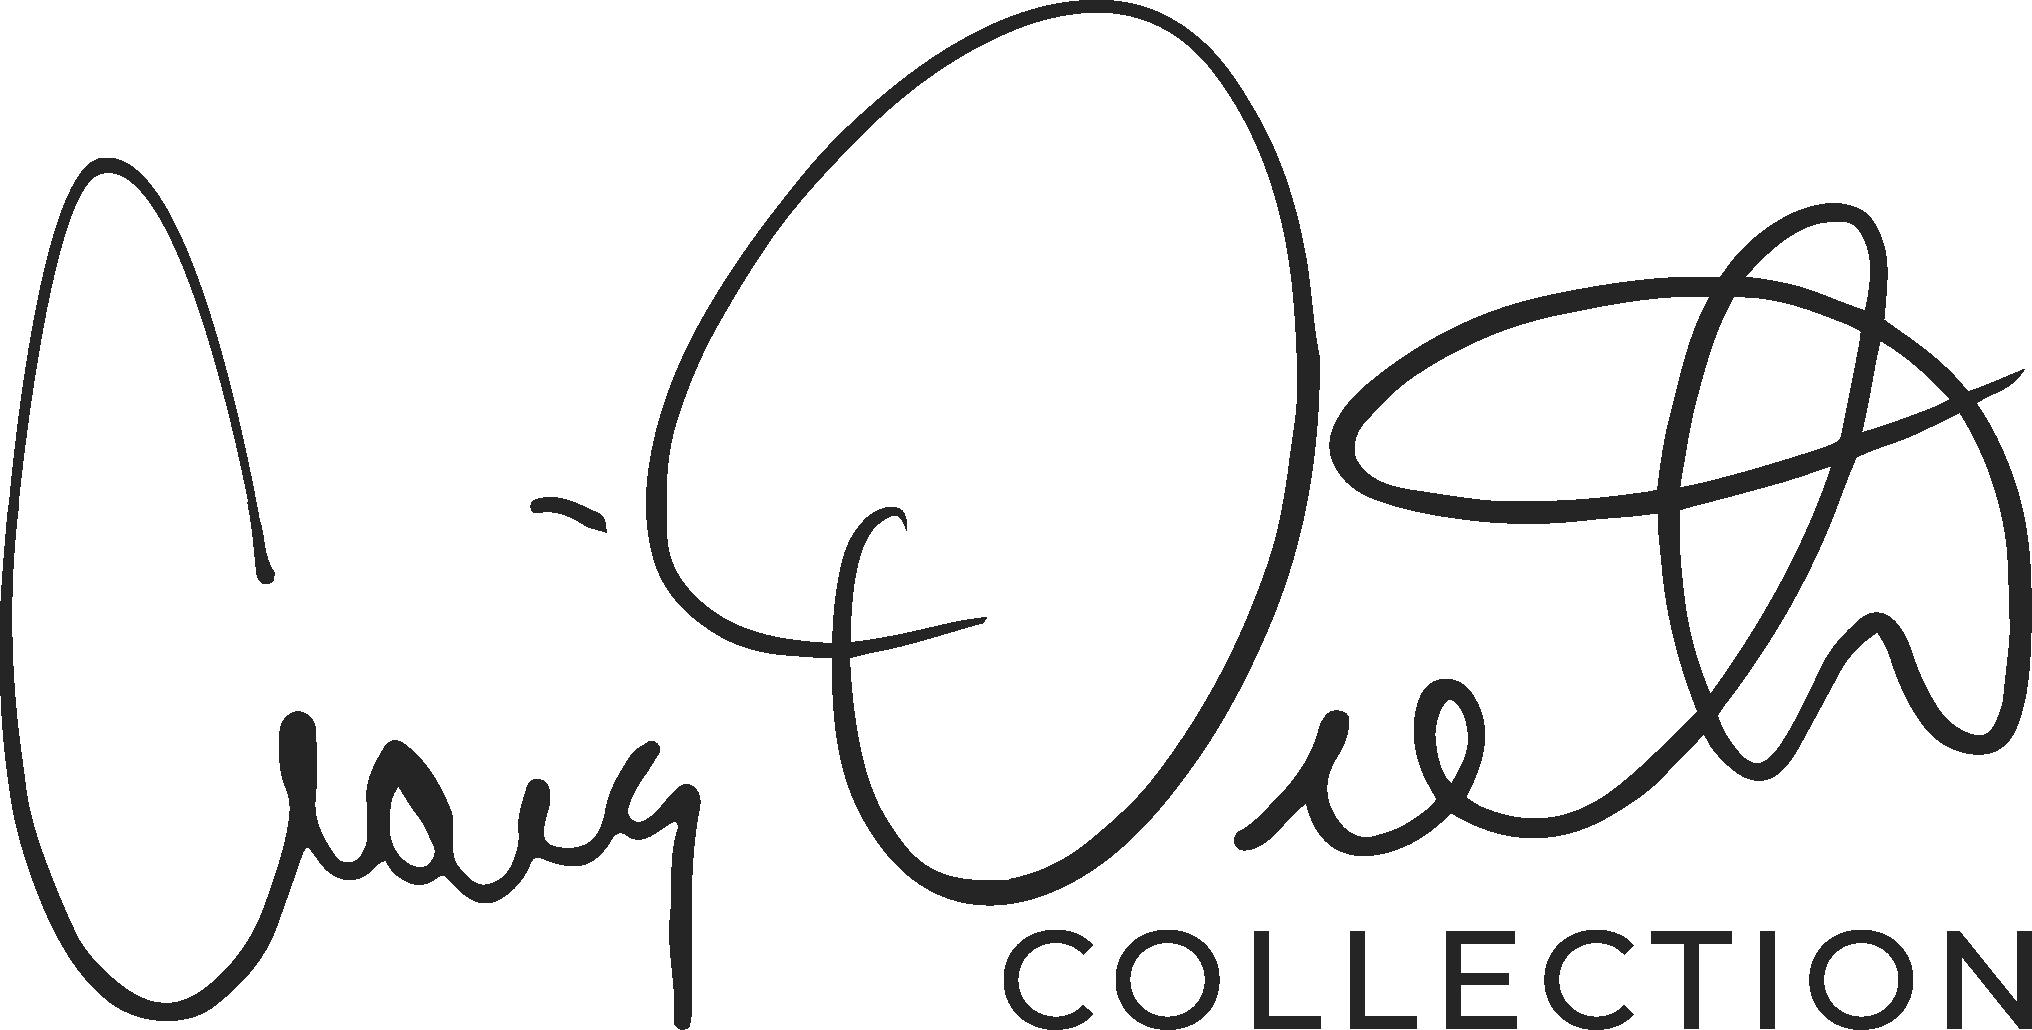 Craig-Dietrich-Collection-Signature-Blac